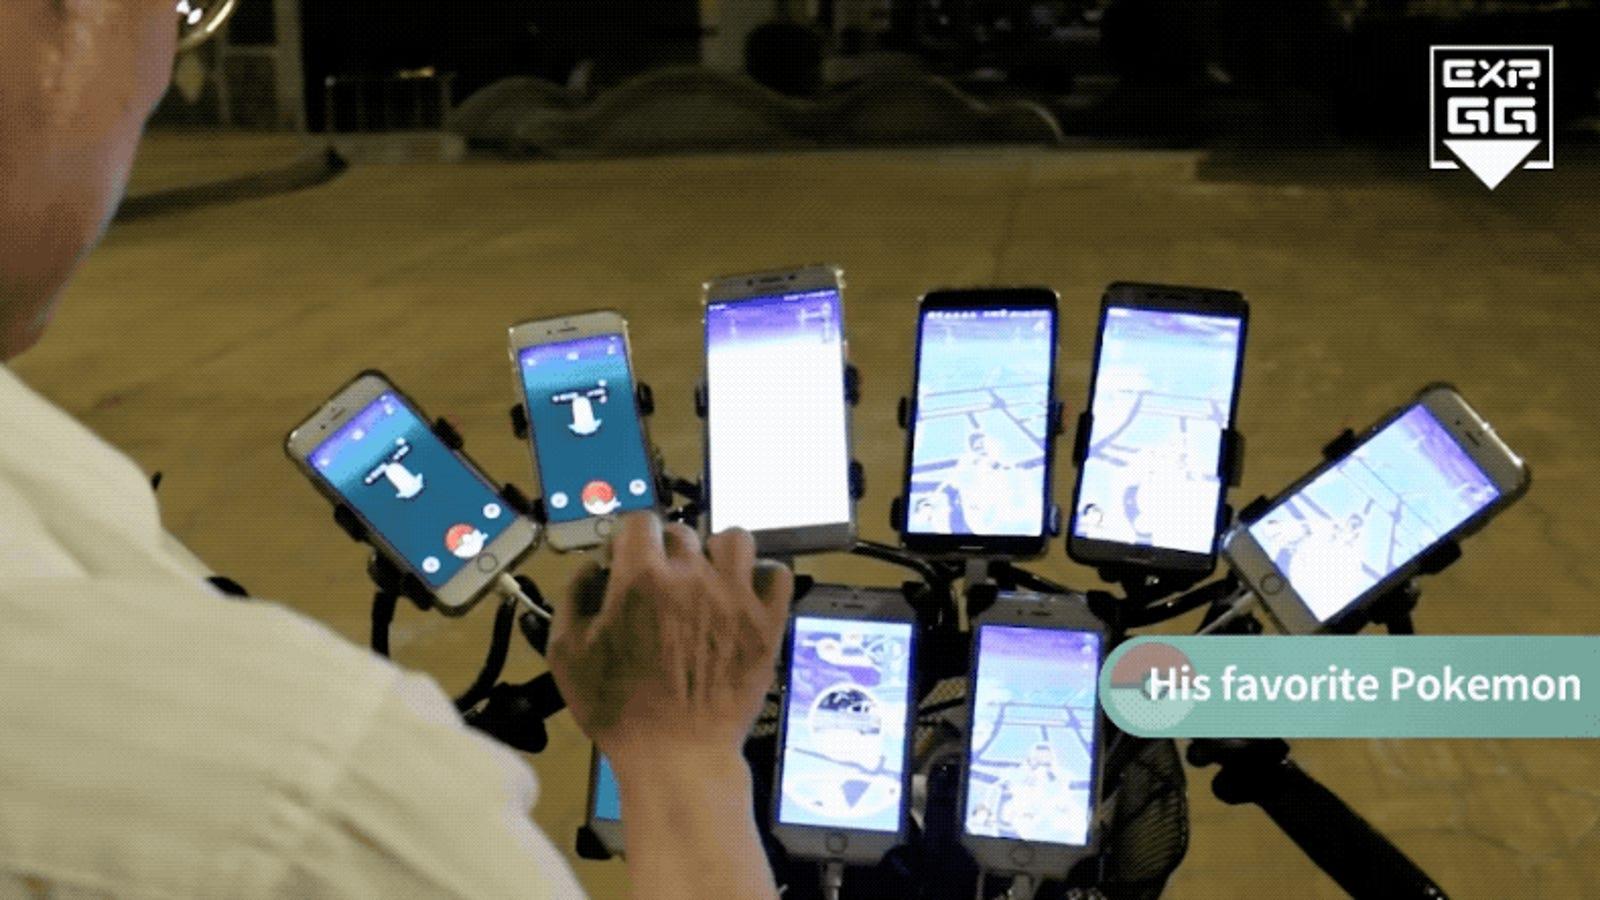 Grandpa Carries 11 Phones To Play Pokémon Go